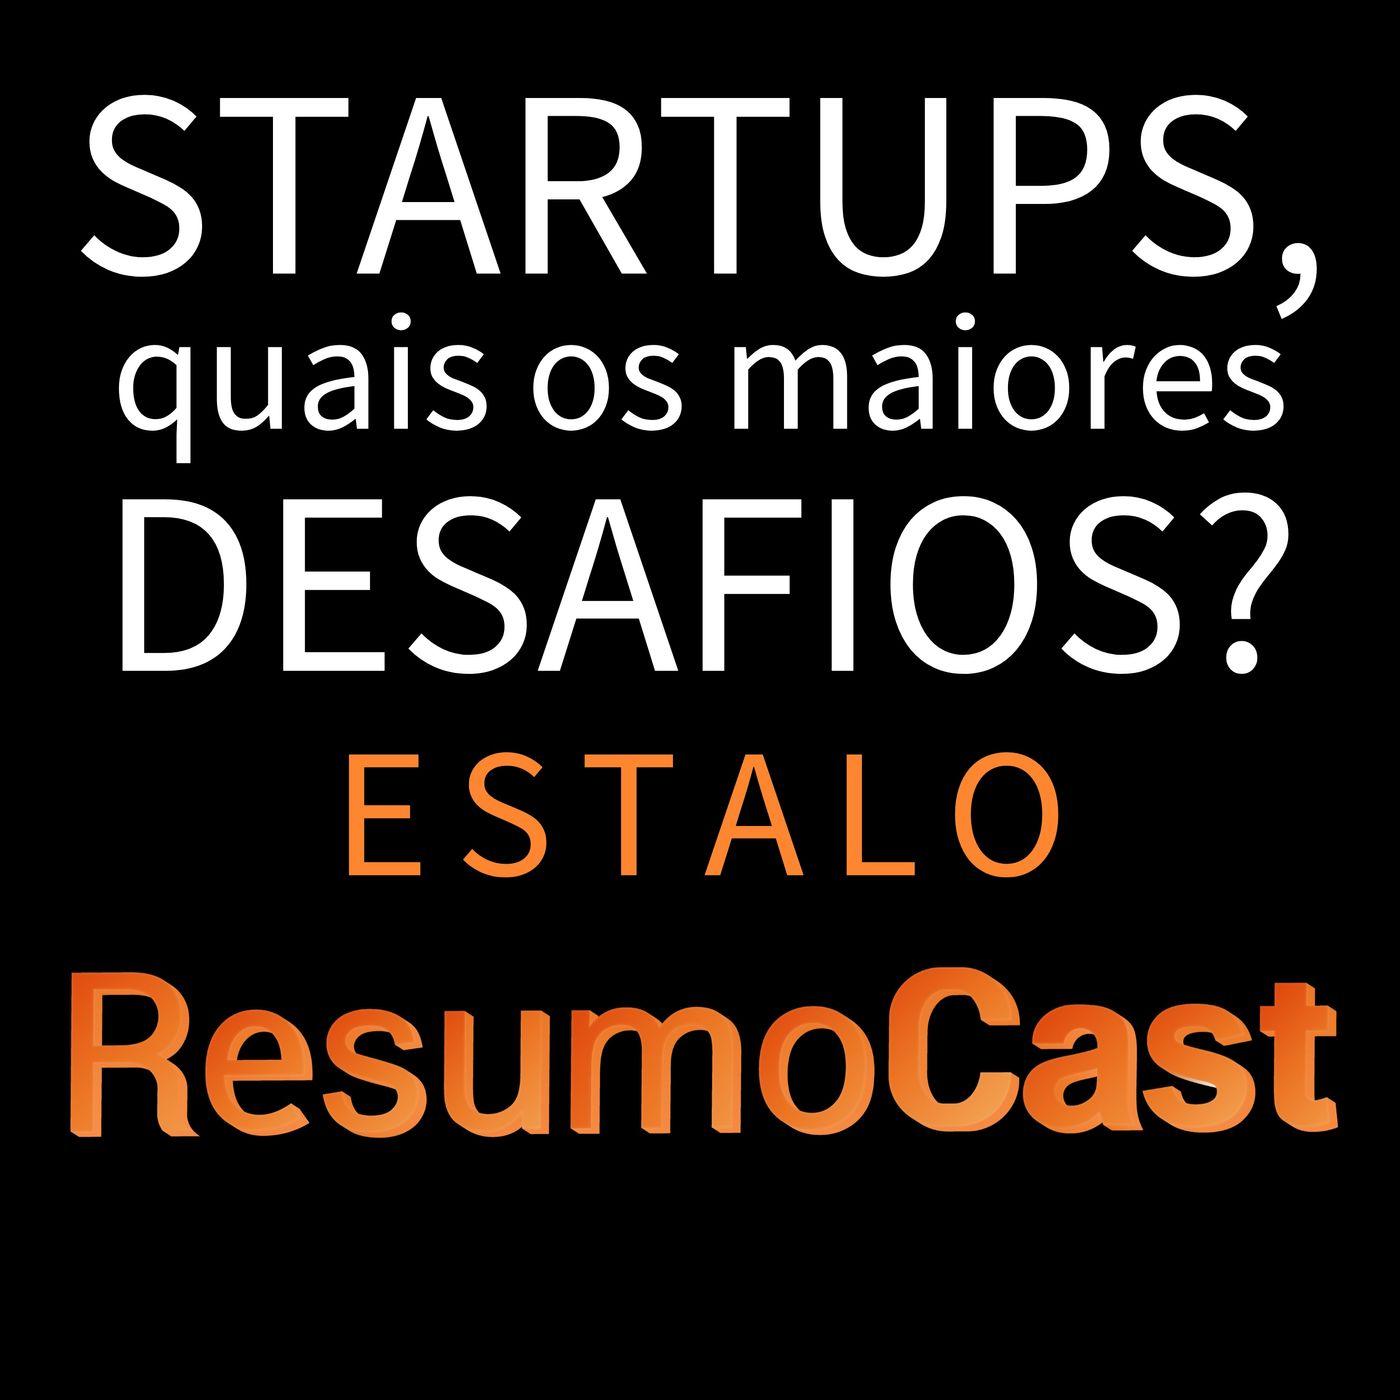 ESTALO | STARTUPS, quais os maiores desafios?